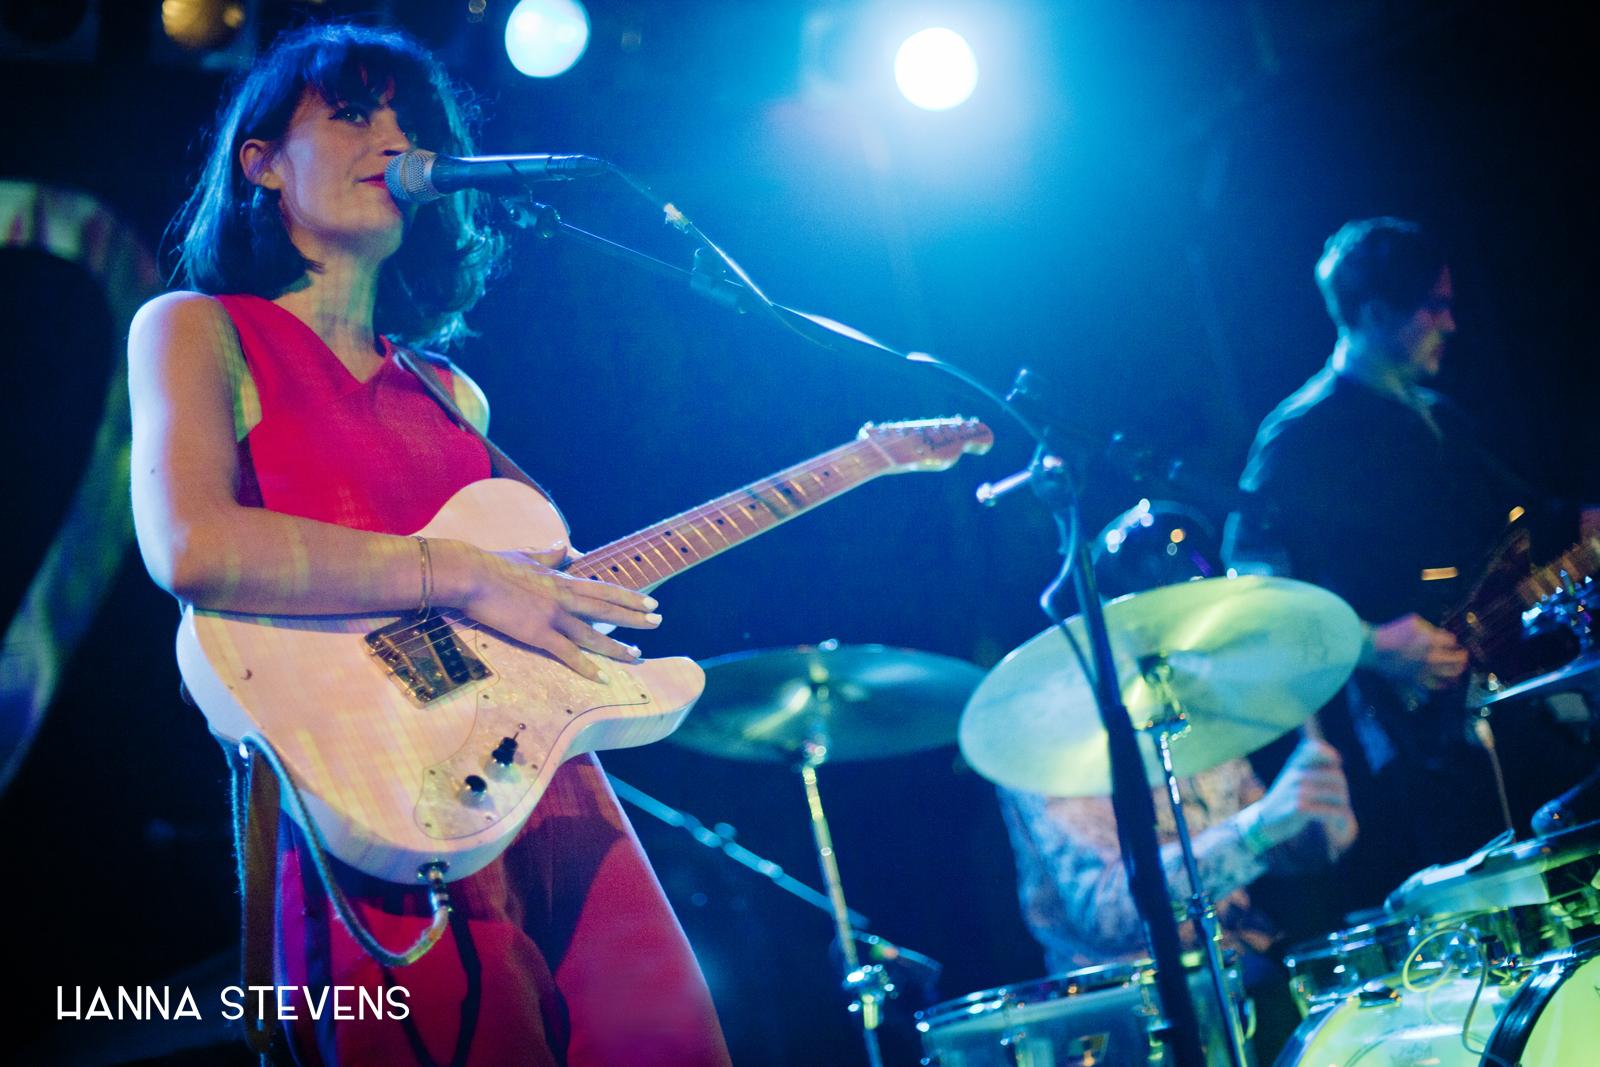 Blouse Live at Neumos (Photo by Hanna Stevens)